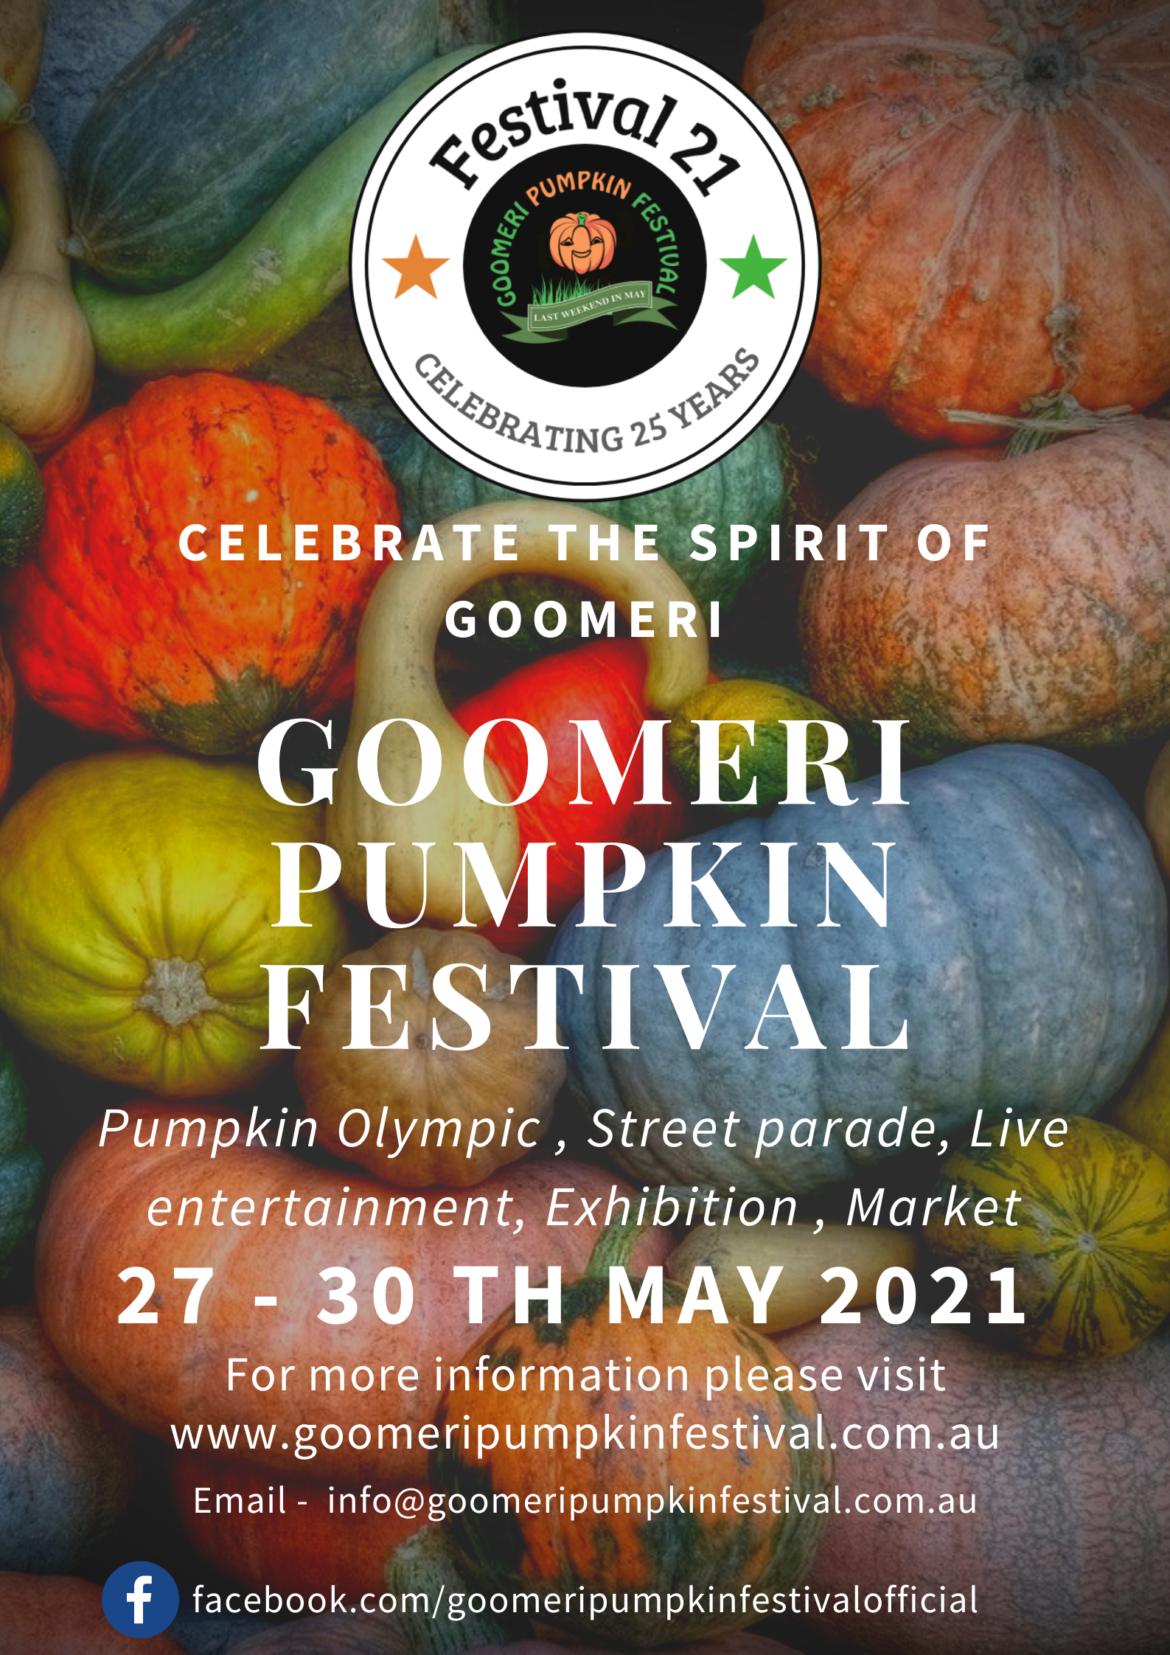 Pumpkin-Fest-Promo-4.png